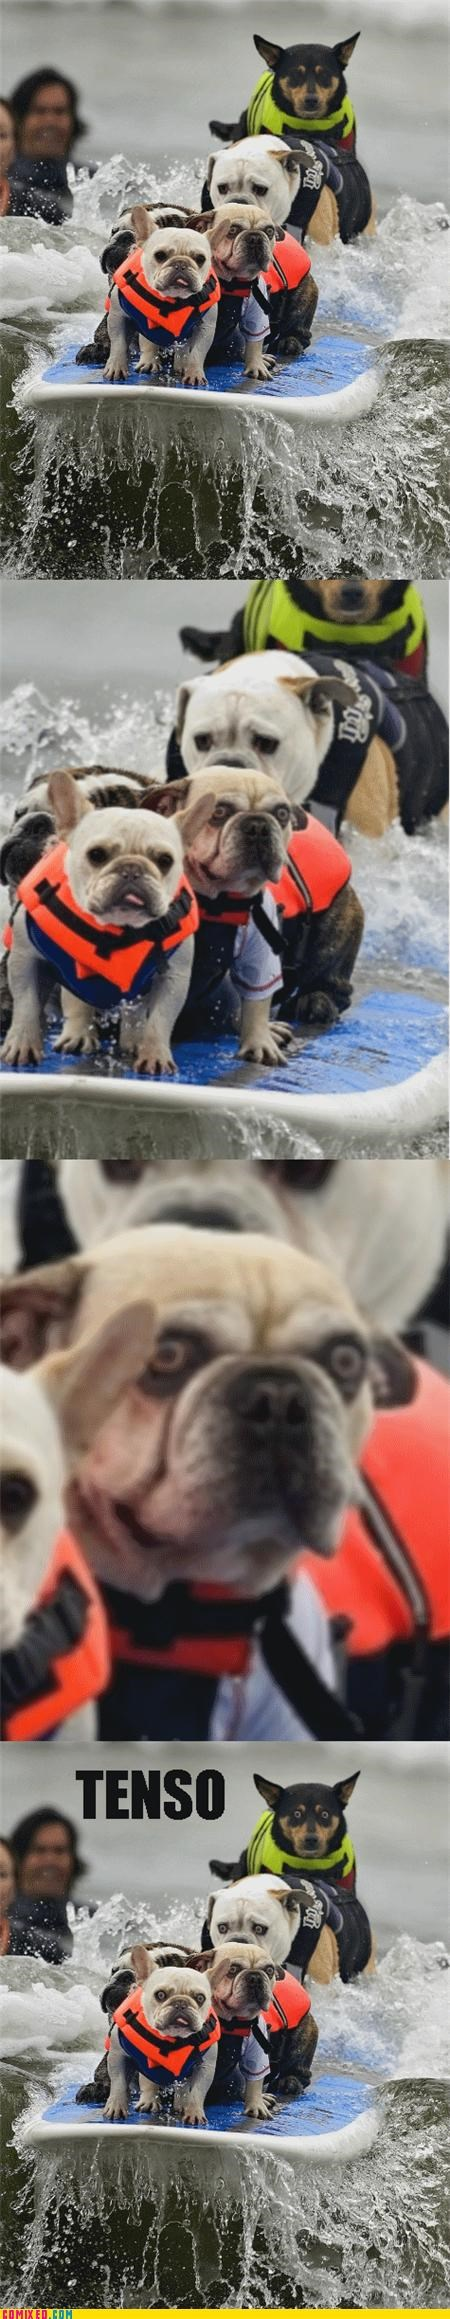 dogs having a blast not enjoyable oh god his eyes Tenso - 5255273216